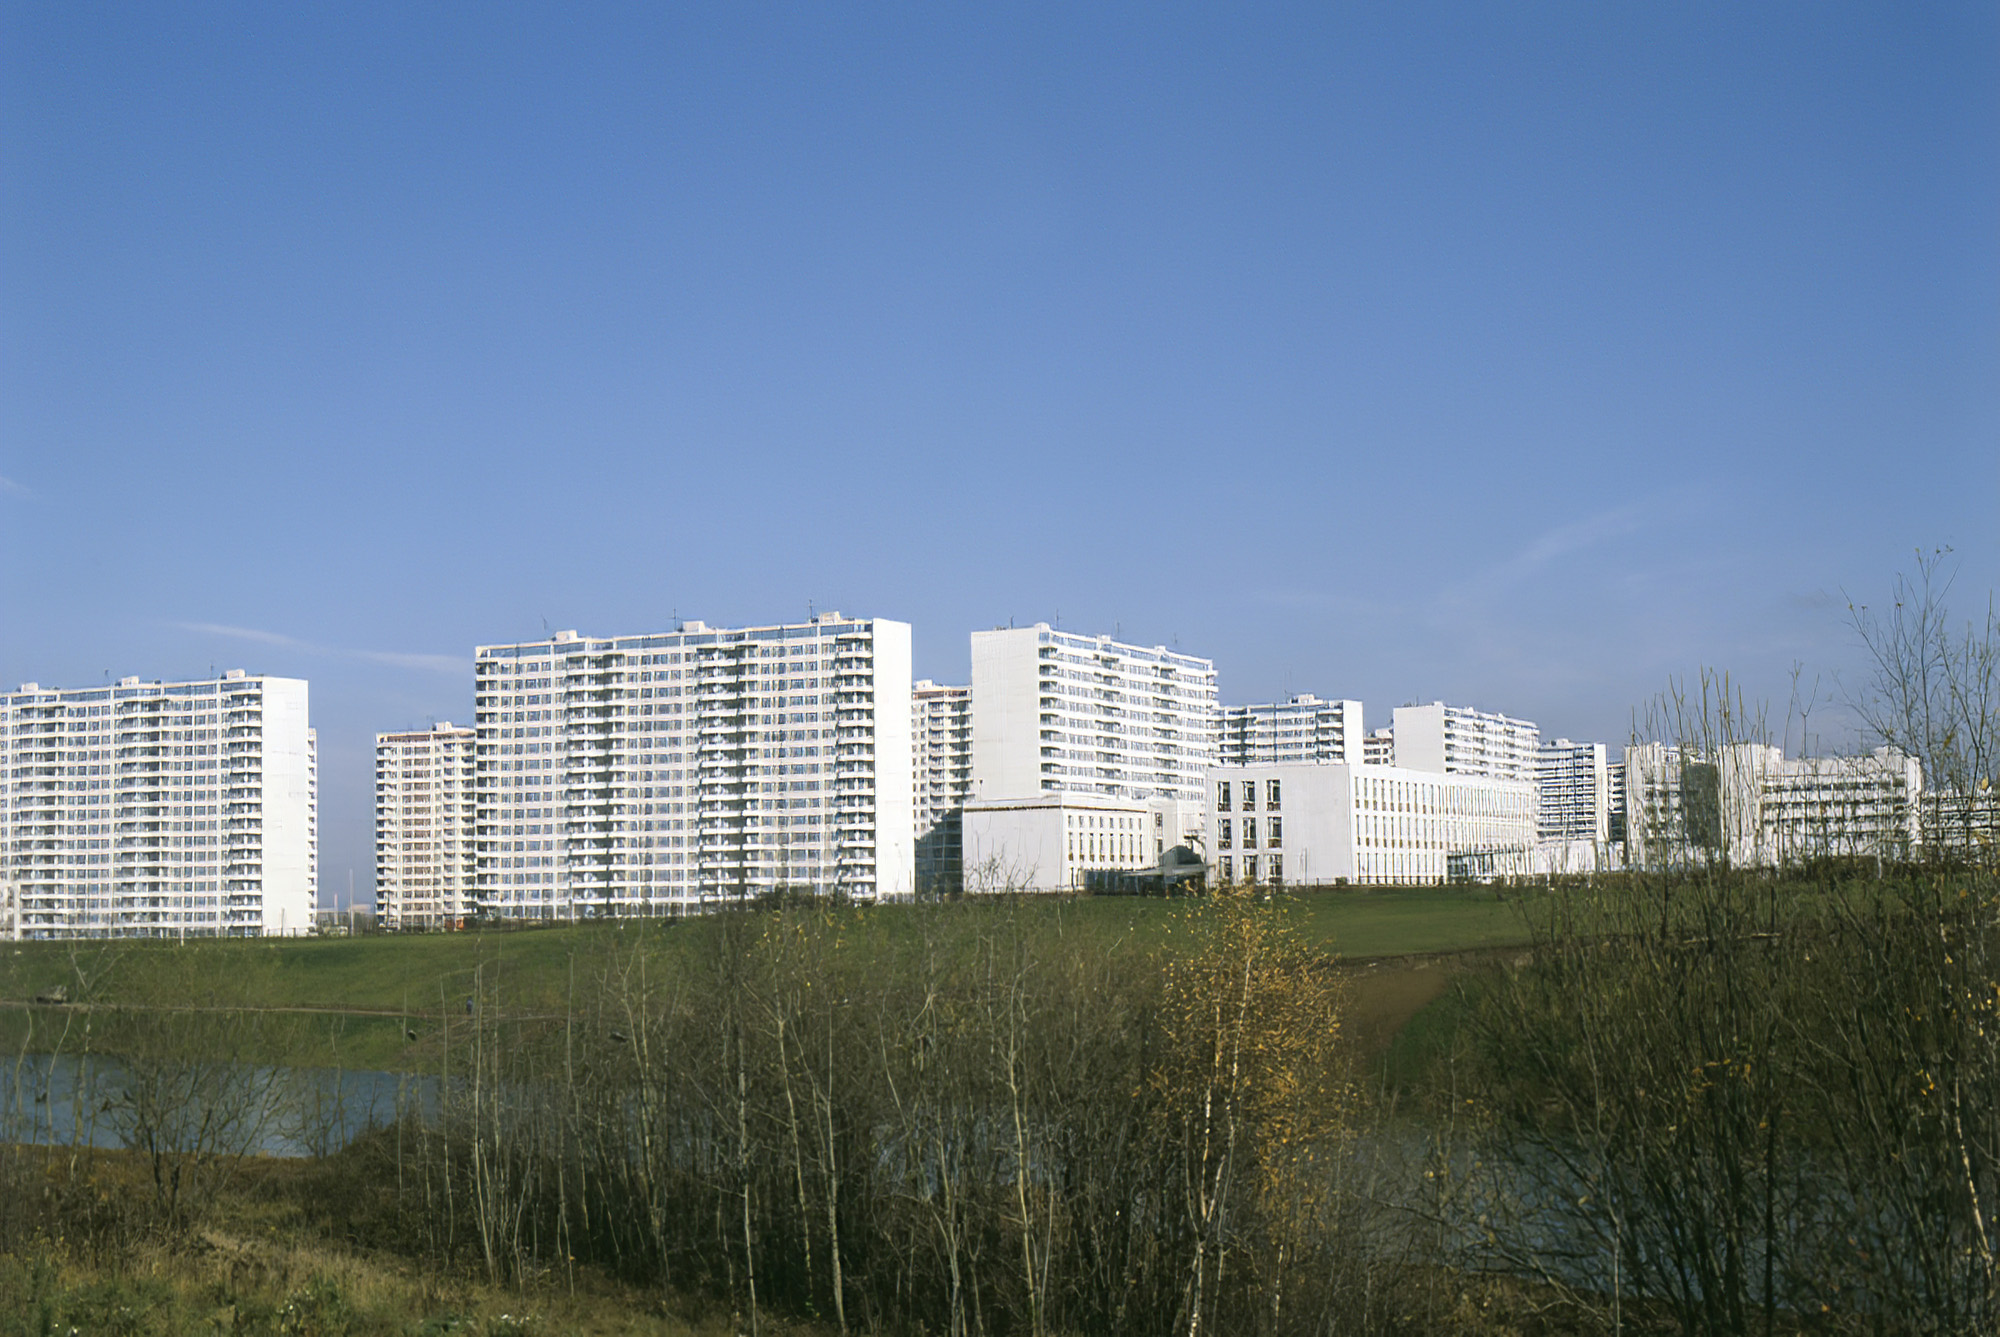 1980 Вид на Олимпийскую деревню. М.Барабанов